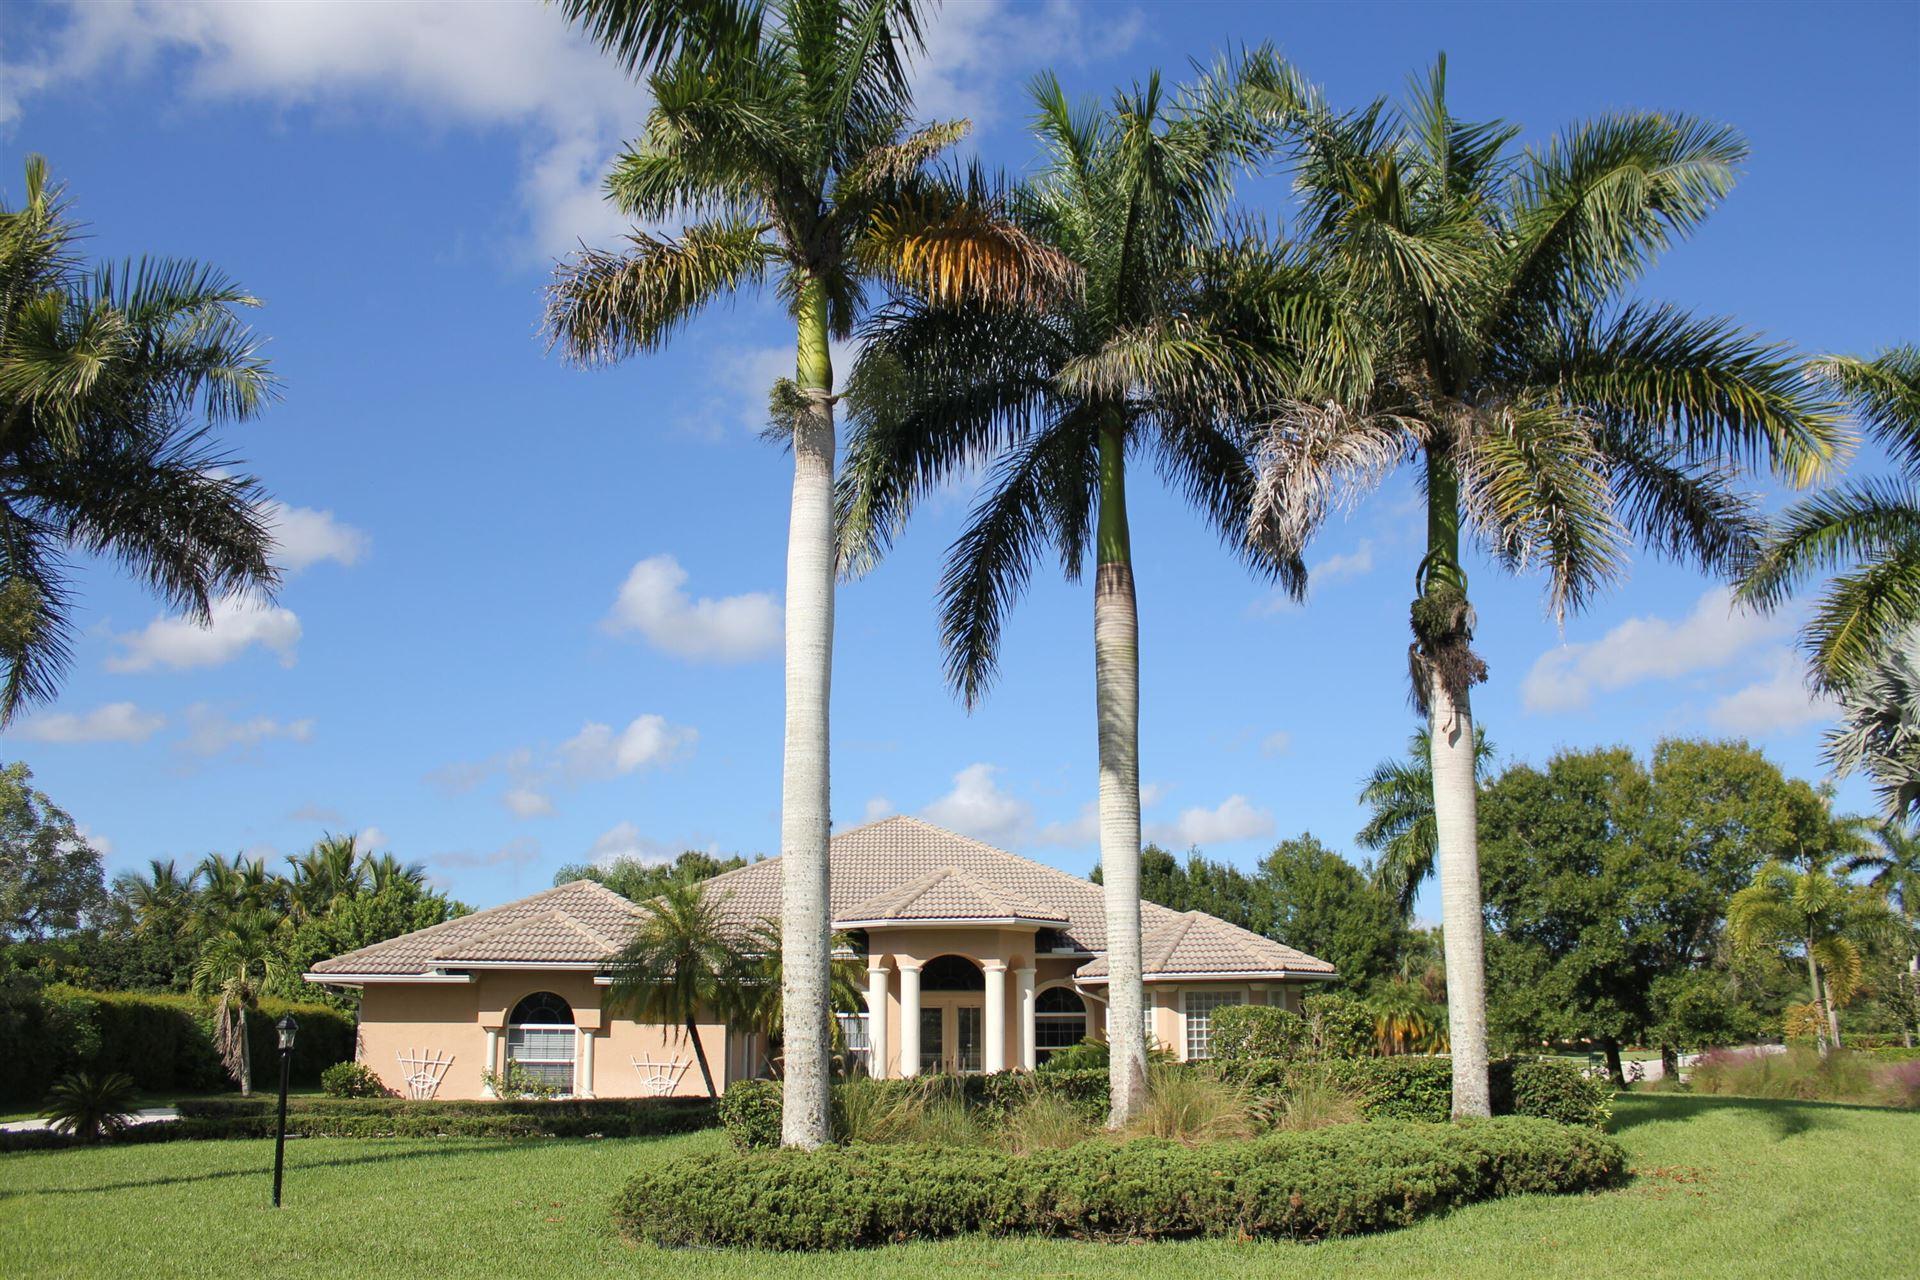 Photo of 7952 Plantation Lakes Drive, Port Saint Lucie, FL 34986 (MLS # RX-10752554)